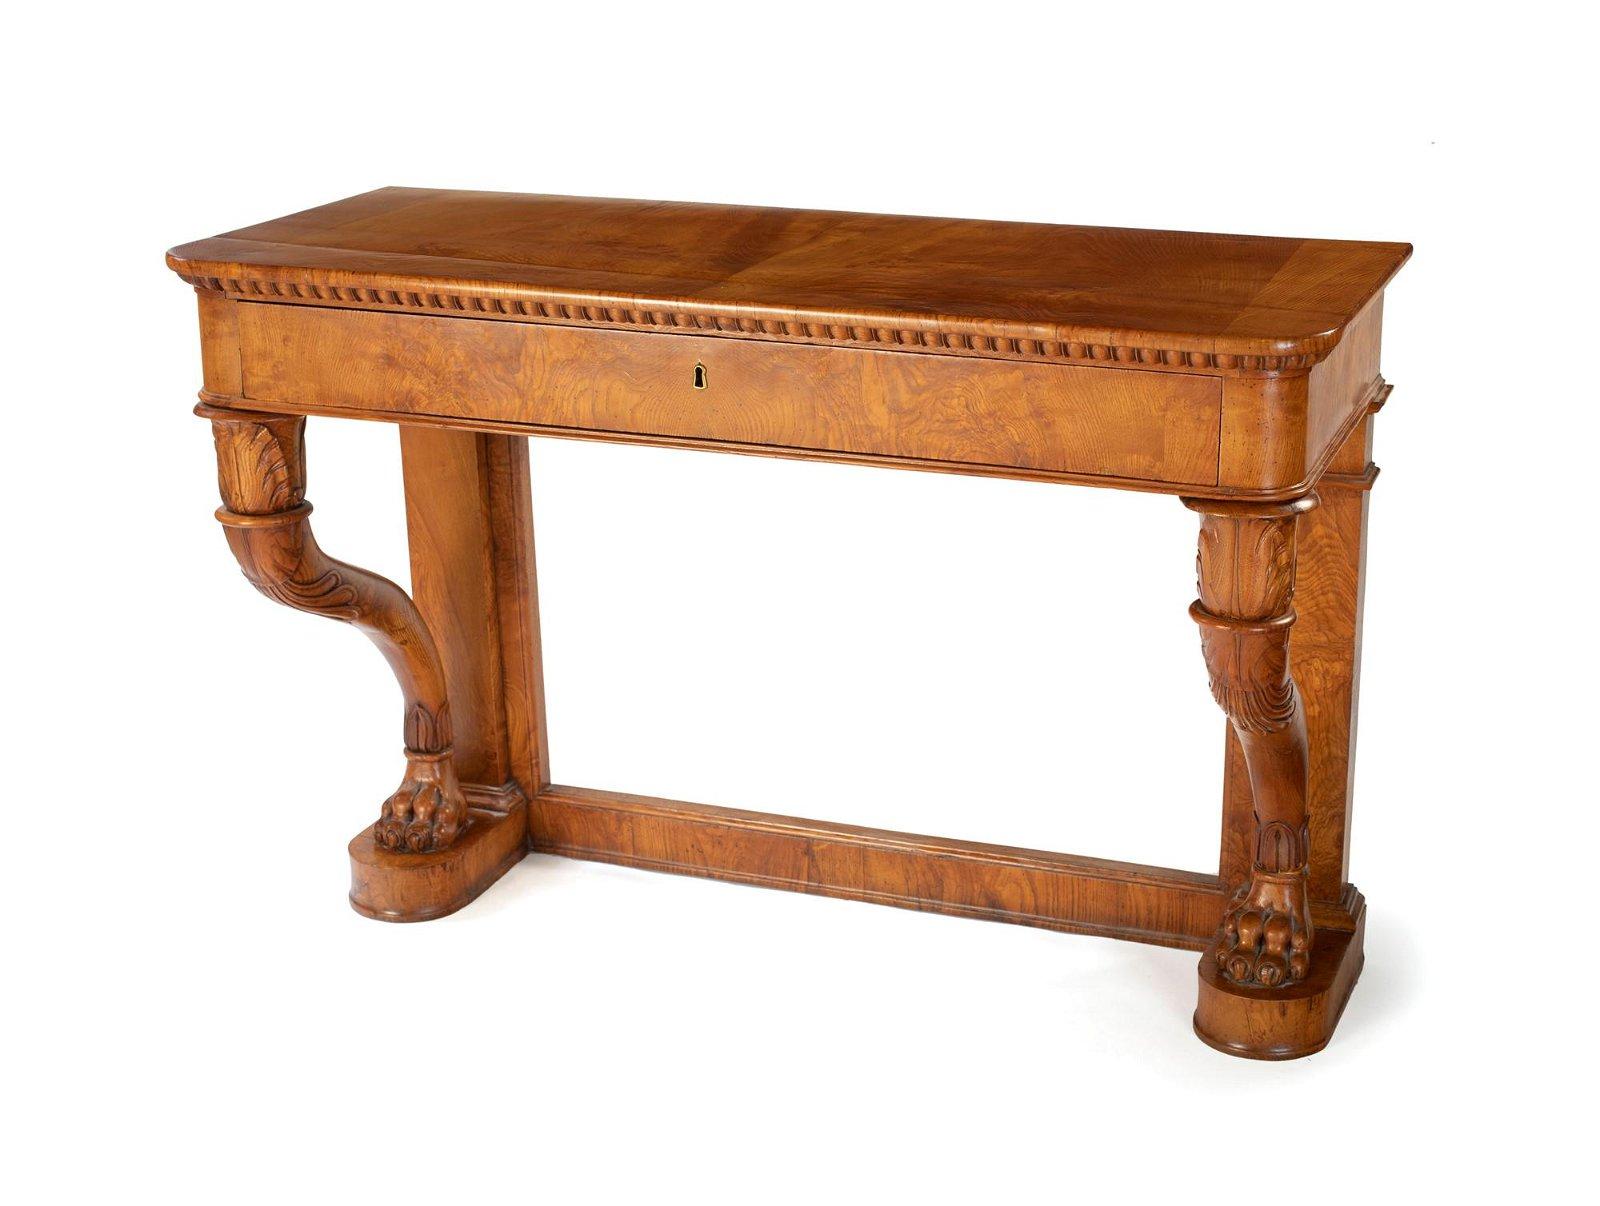 Elm wood console